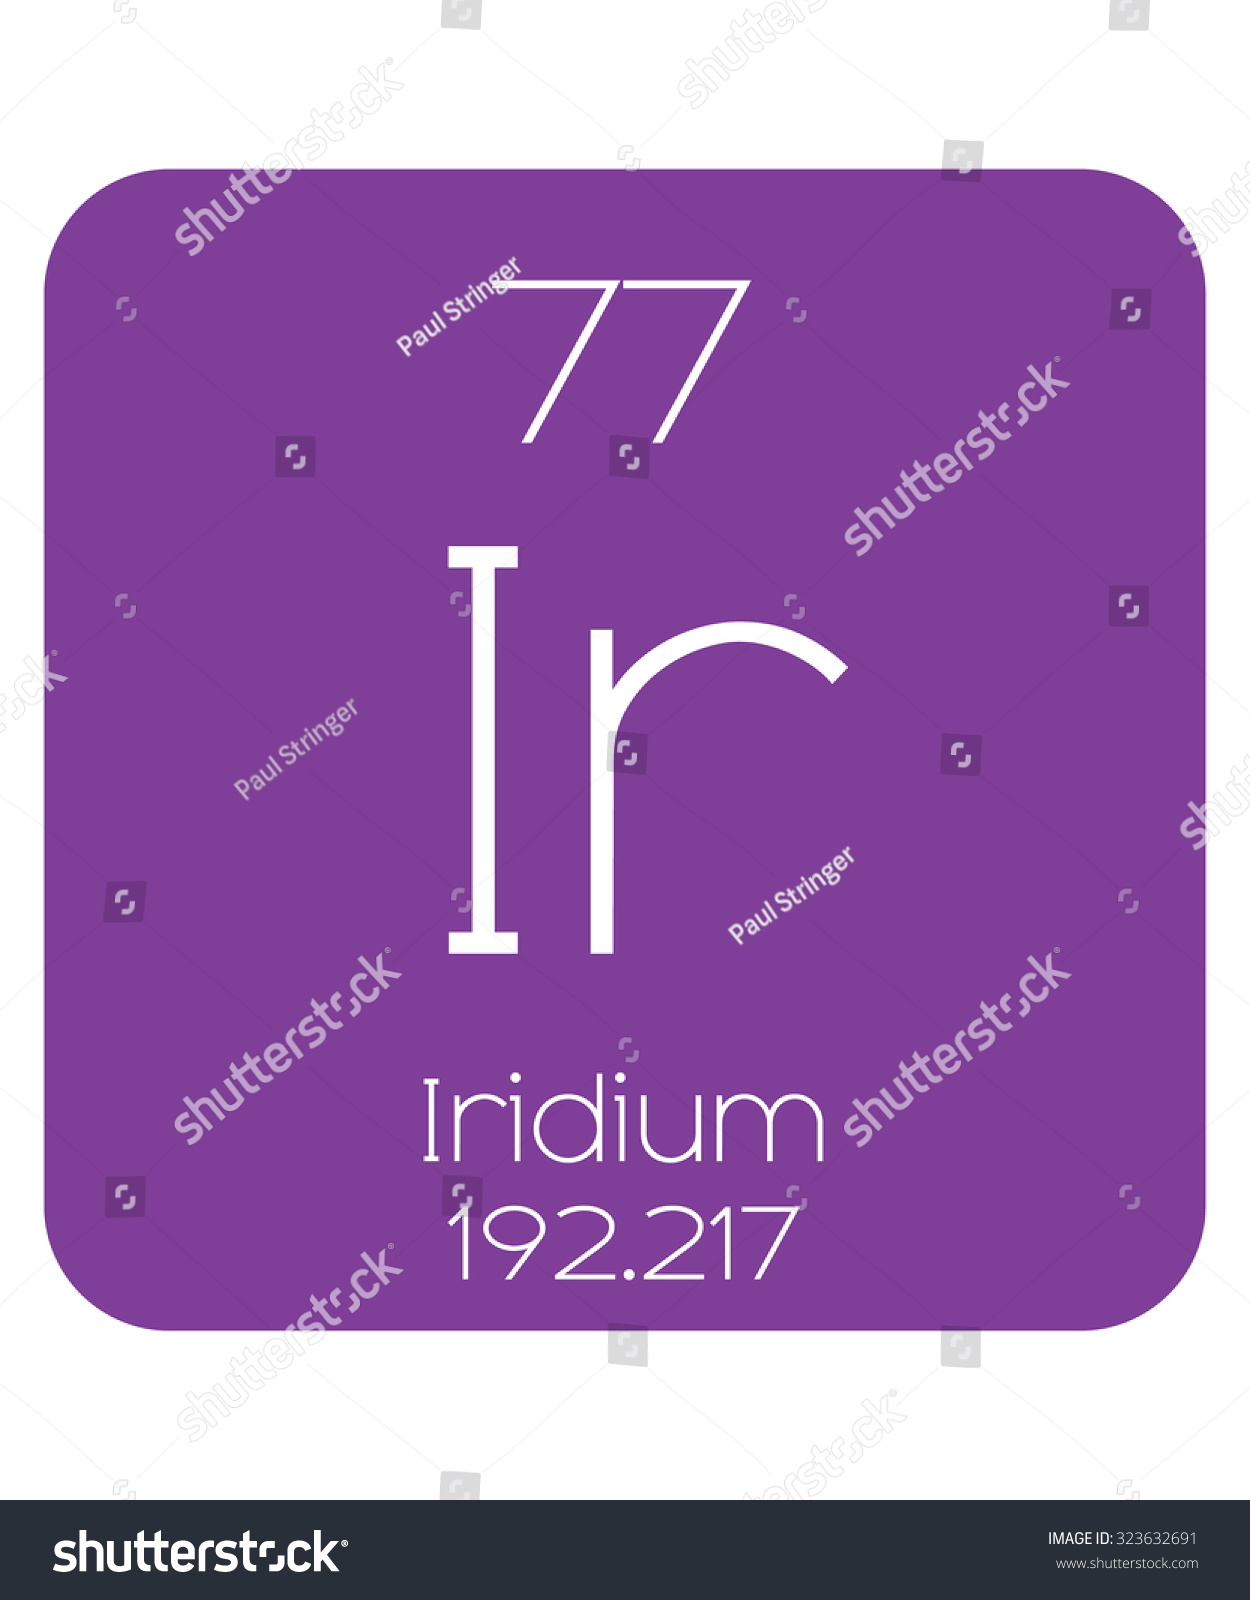 Periodic table elements iridium stock vector 323632691 shutterstock the periodic table of the elements iridium gamestrikefo Gallery